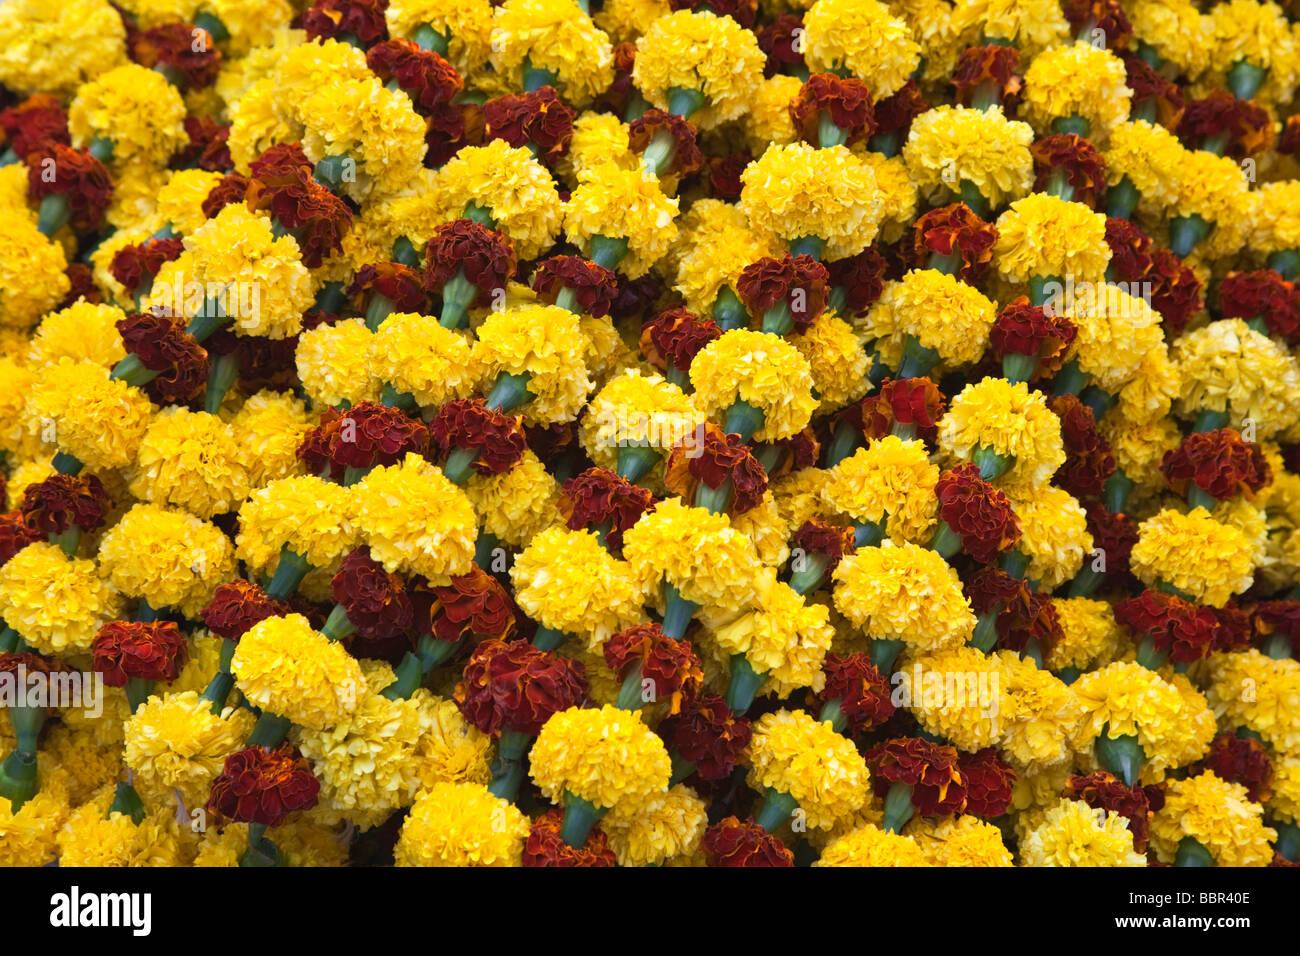 Yellow, orange and red carnations at Kolkata Flower Market, Kolkata, India - Stock Image